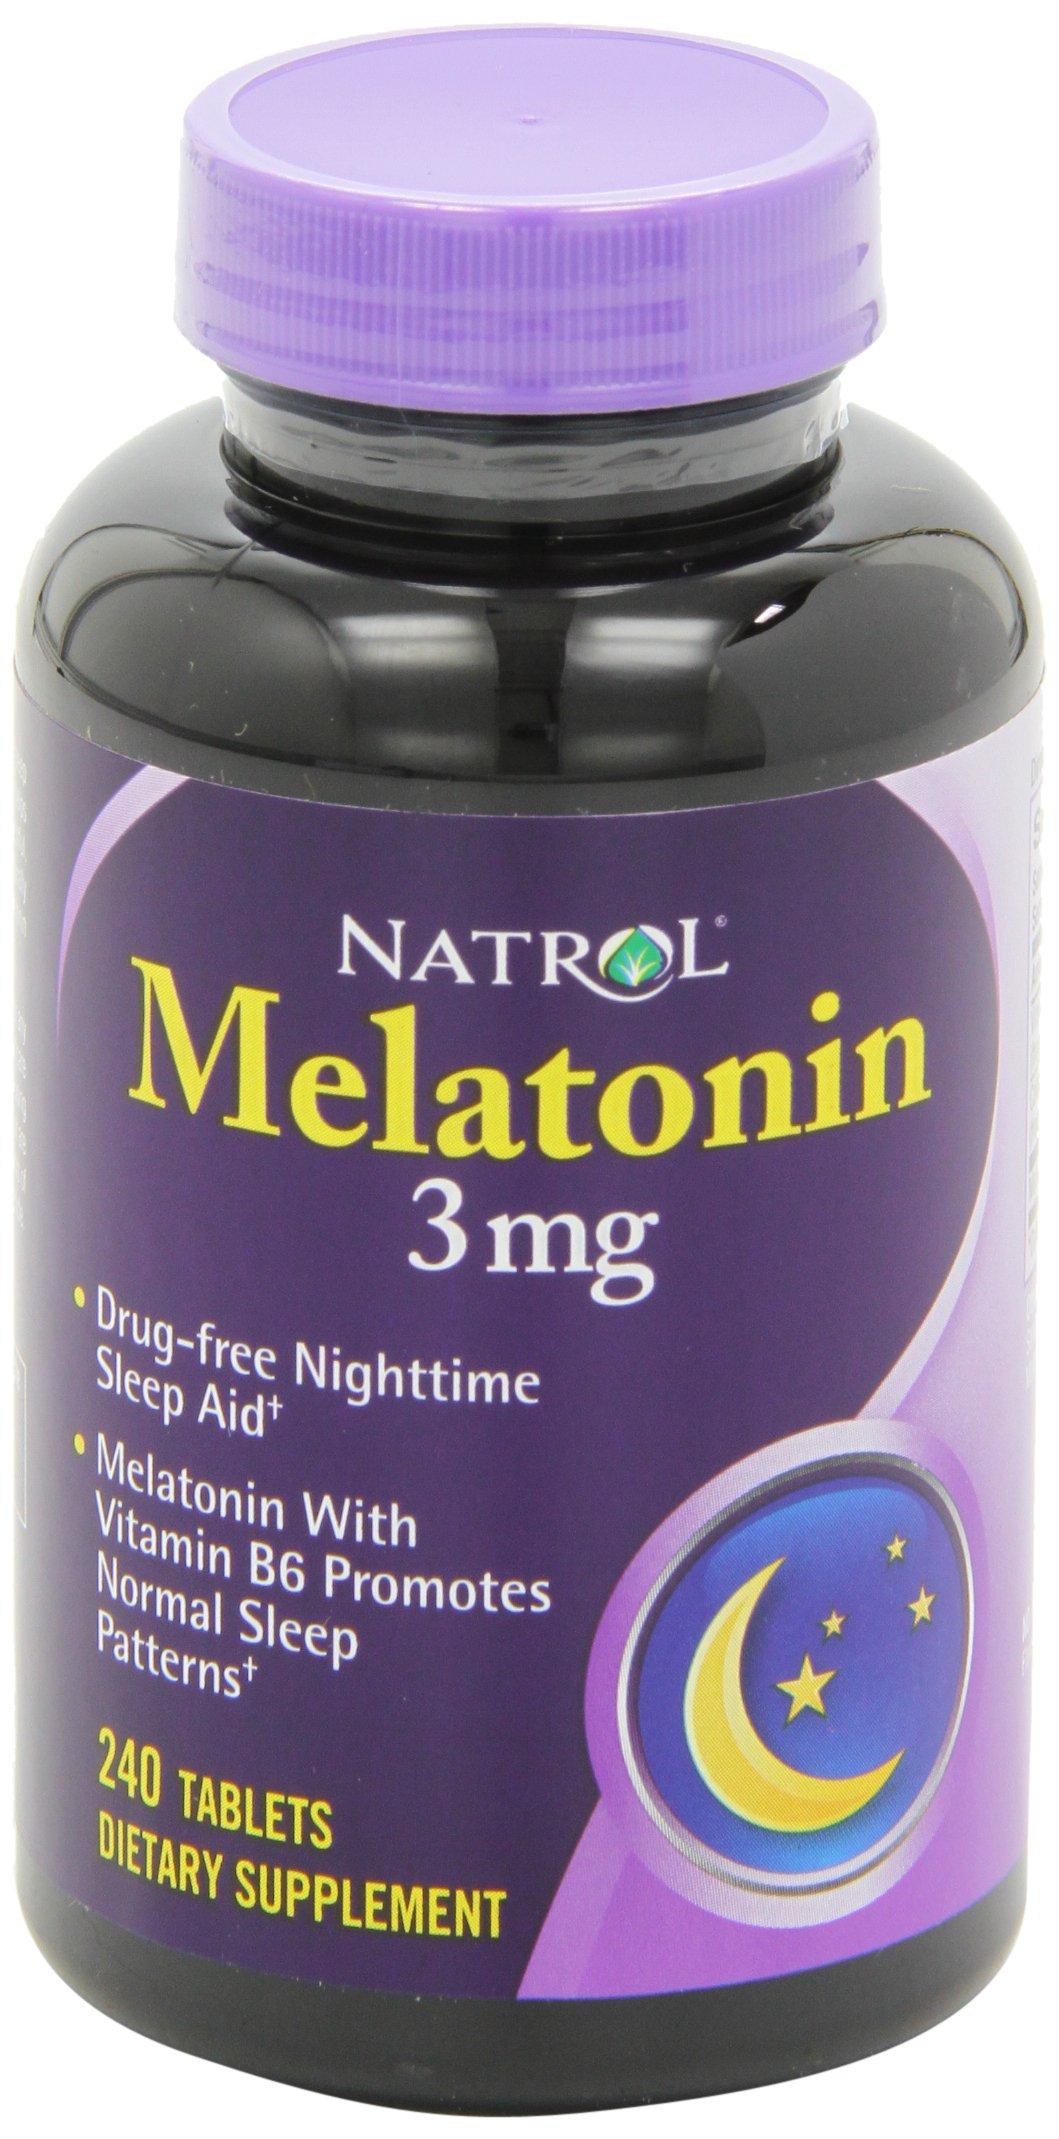 Natrol Melatonin Tablets, 3mg, 240 Count (Pack of 2)